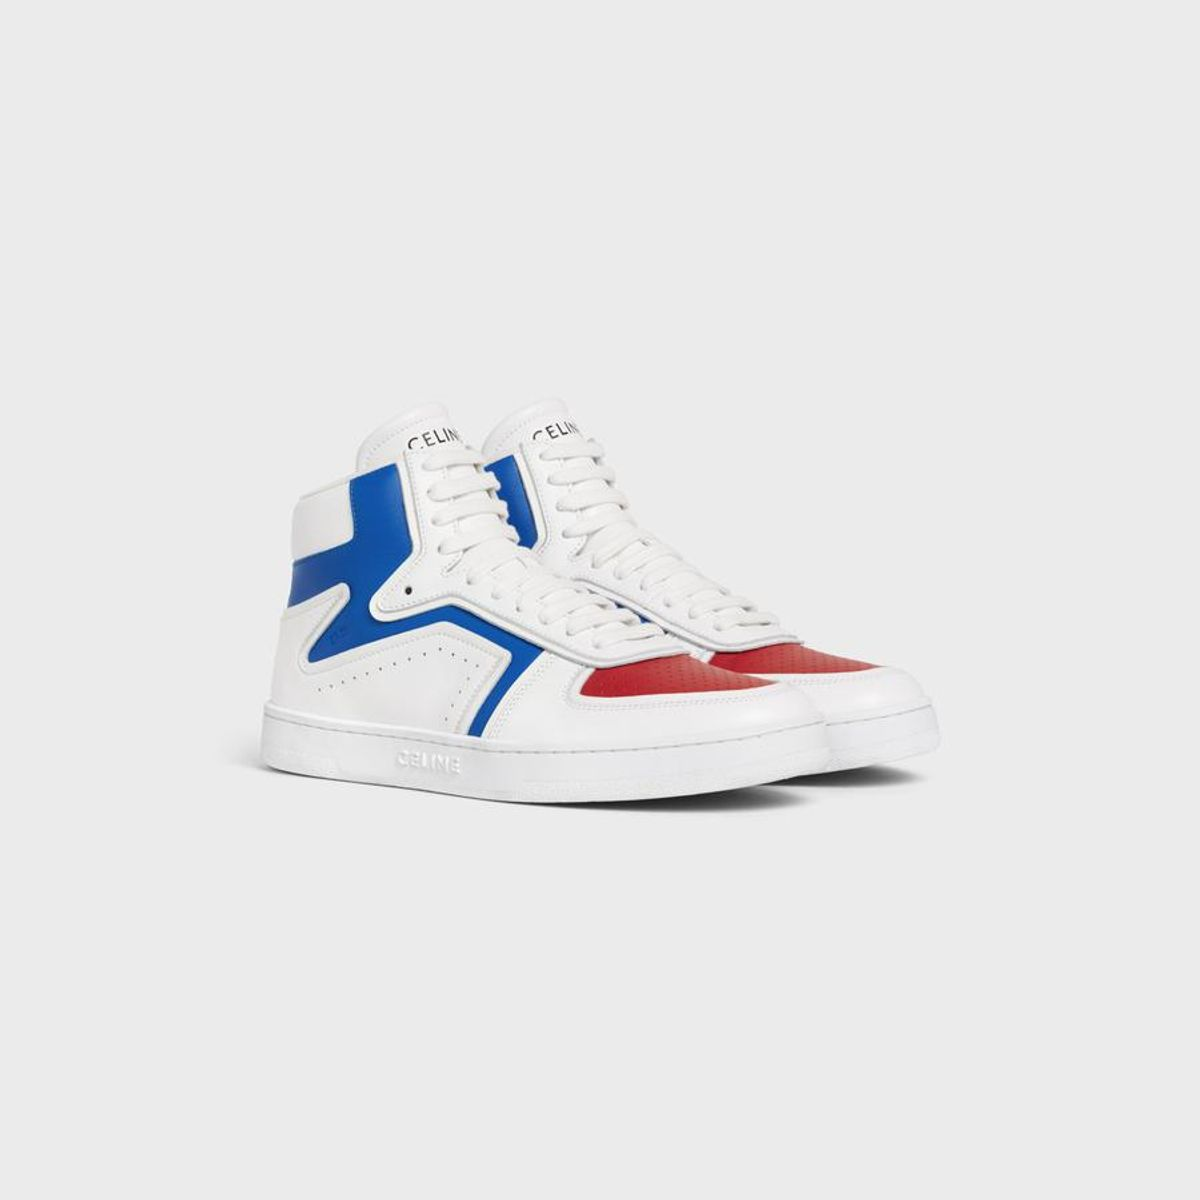 """Z"" Trainer CT-01 High Top Sneaker"